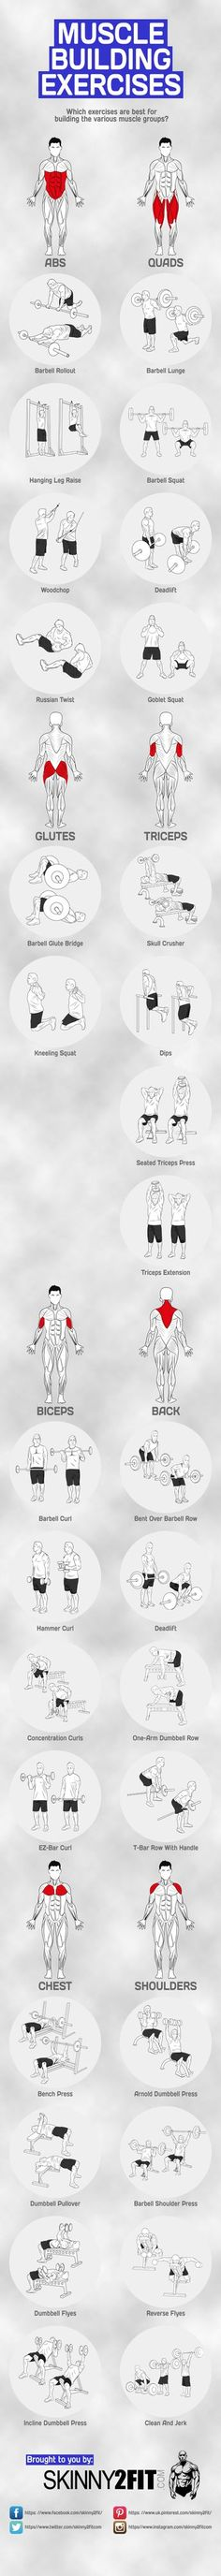 Guia de ejercicios